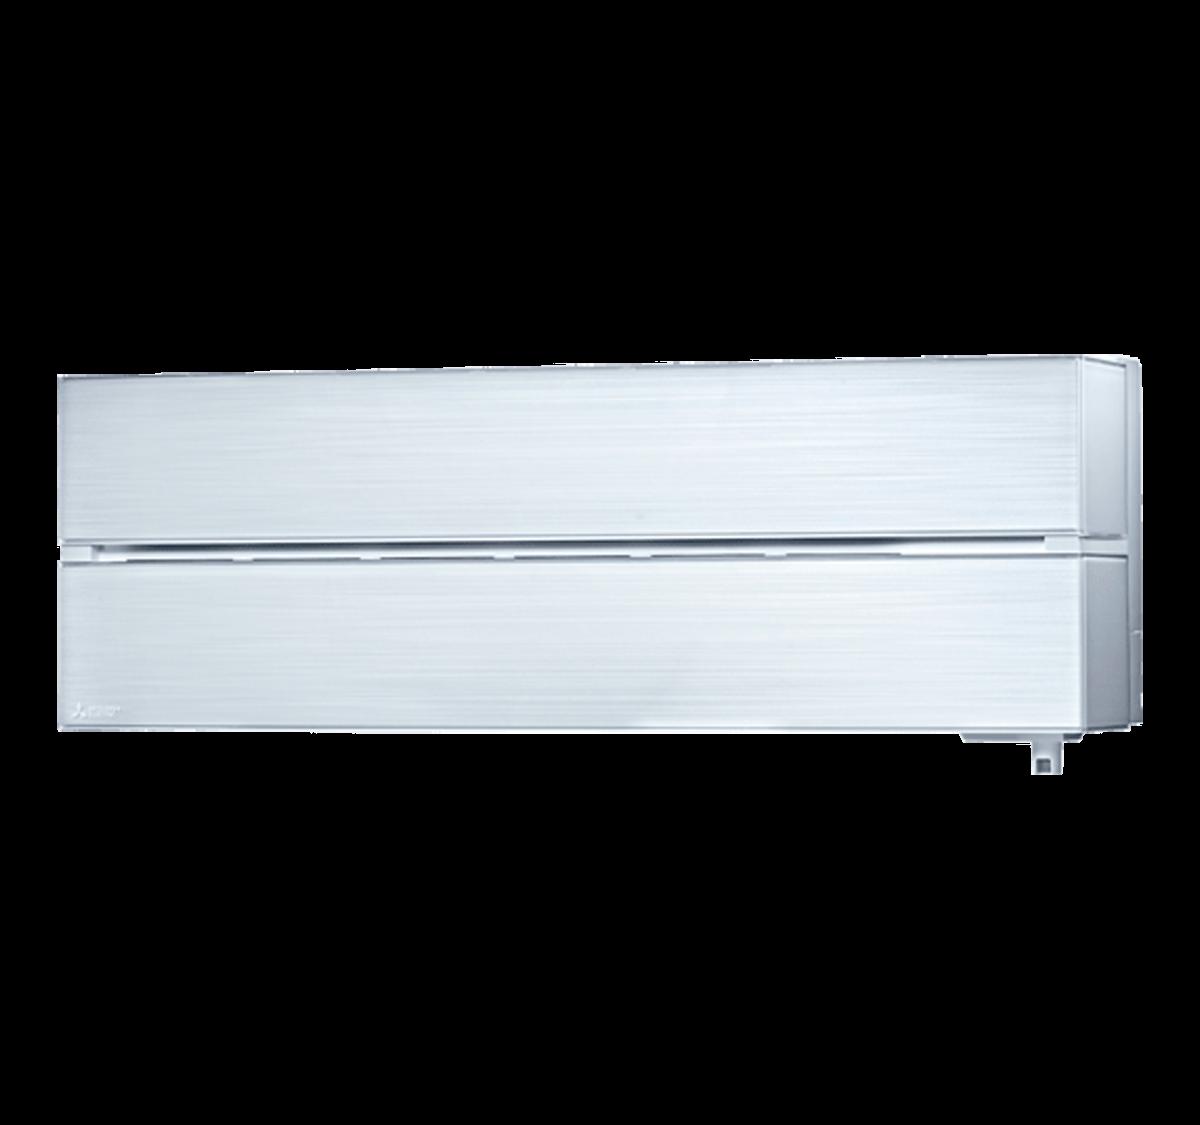 aire acondicionado blanco perla unidad interior mitsubishi electric inverter msz ln50vgv serie kirigamine style modelo msz ln50vgv precio incluido instalacion caseragua 01